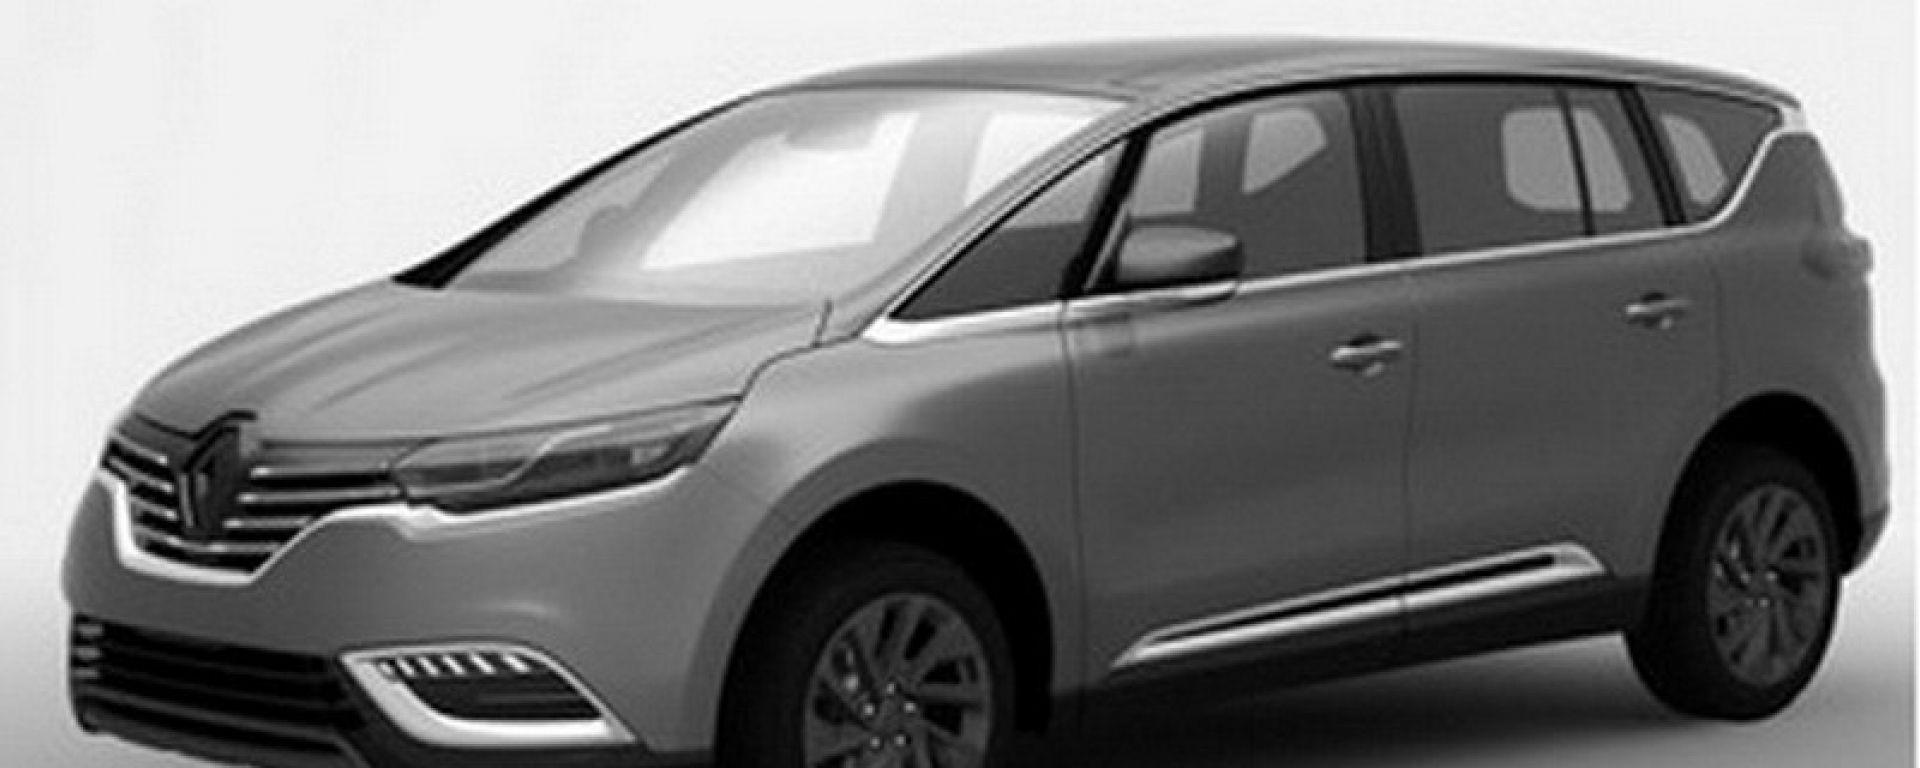 Renault Espace 2015, le prime tracce